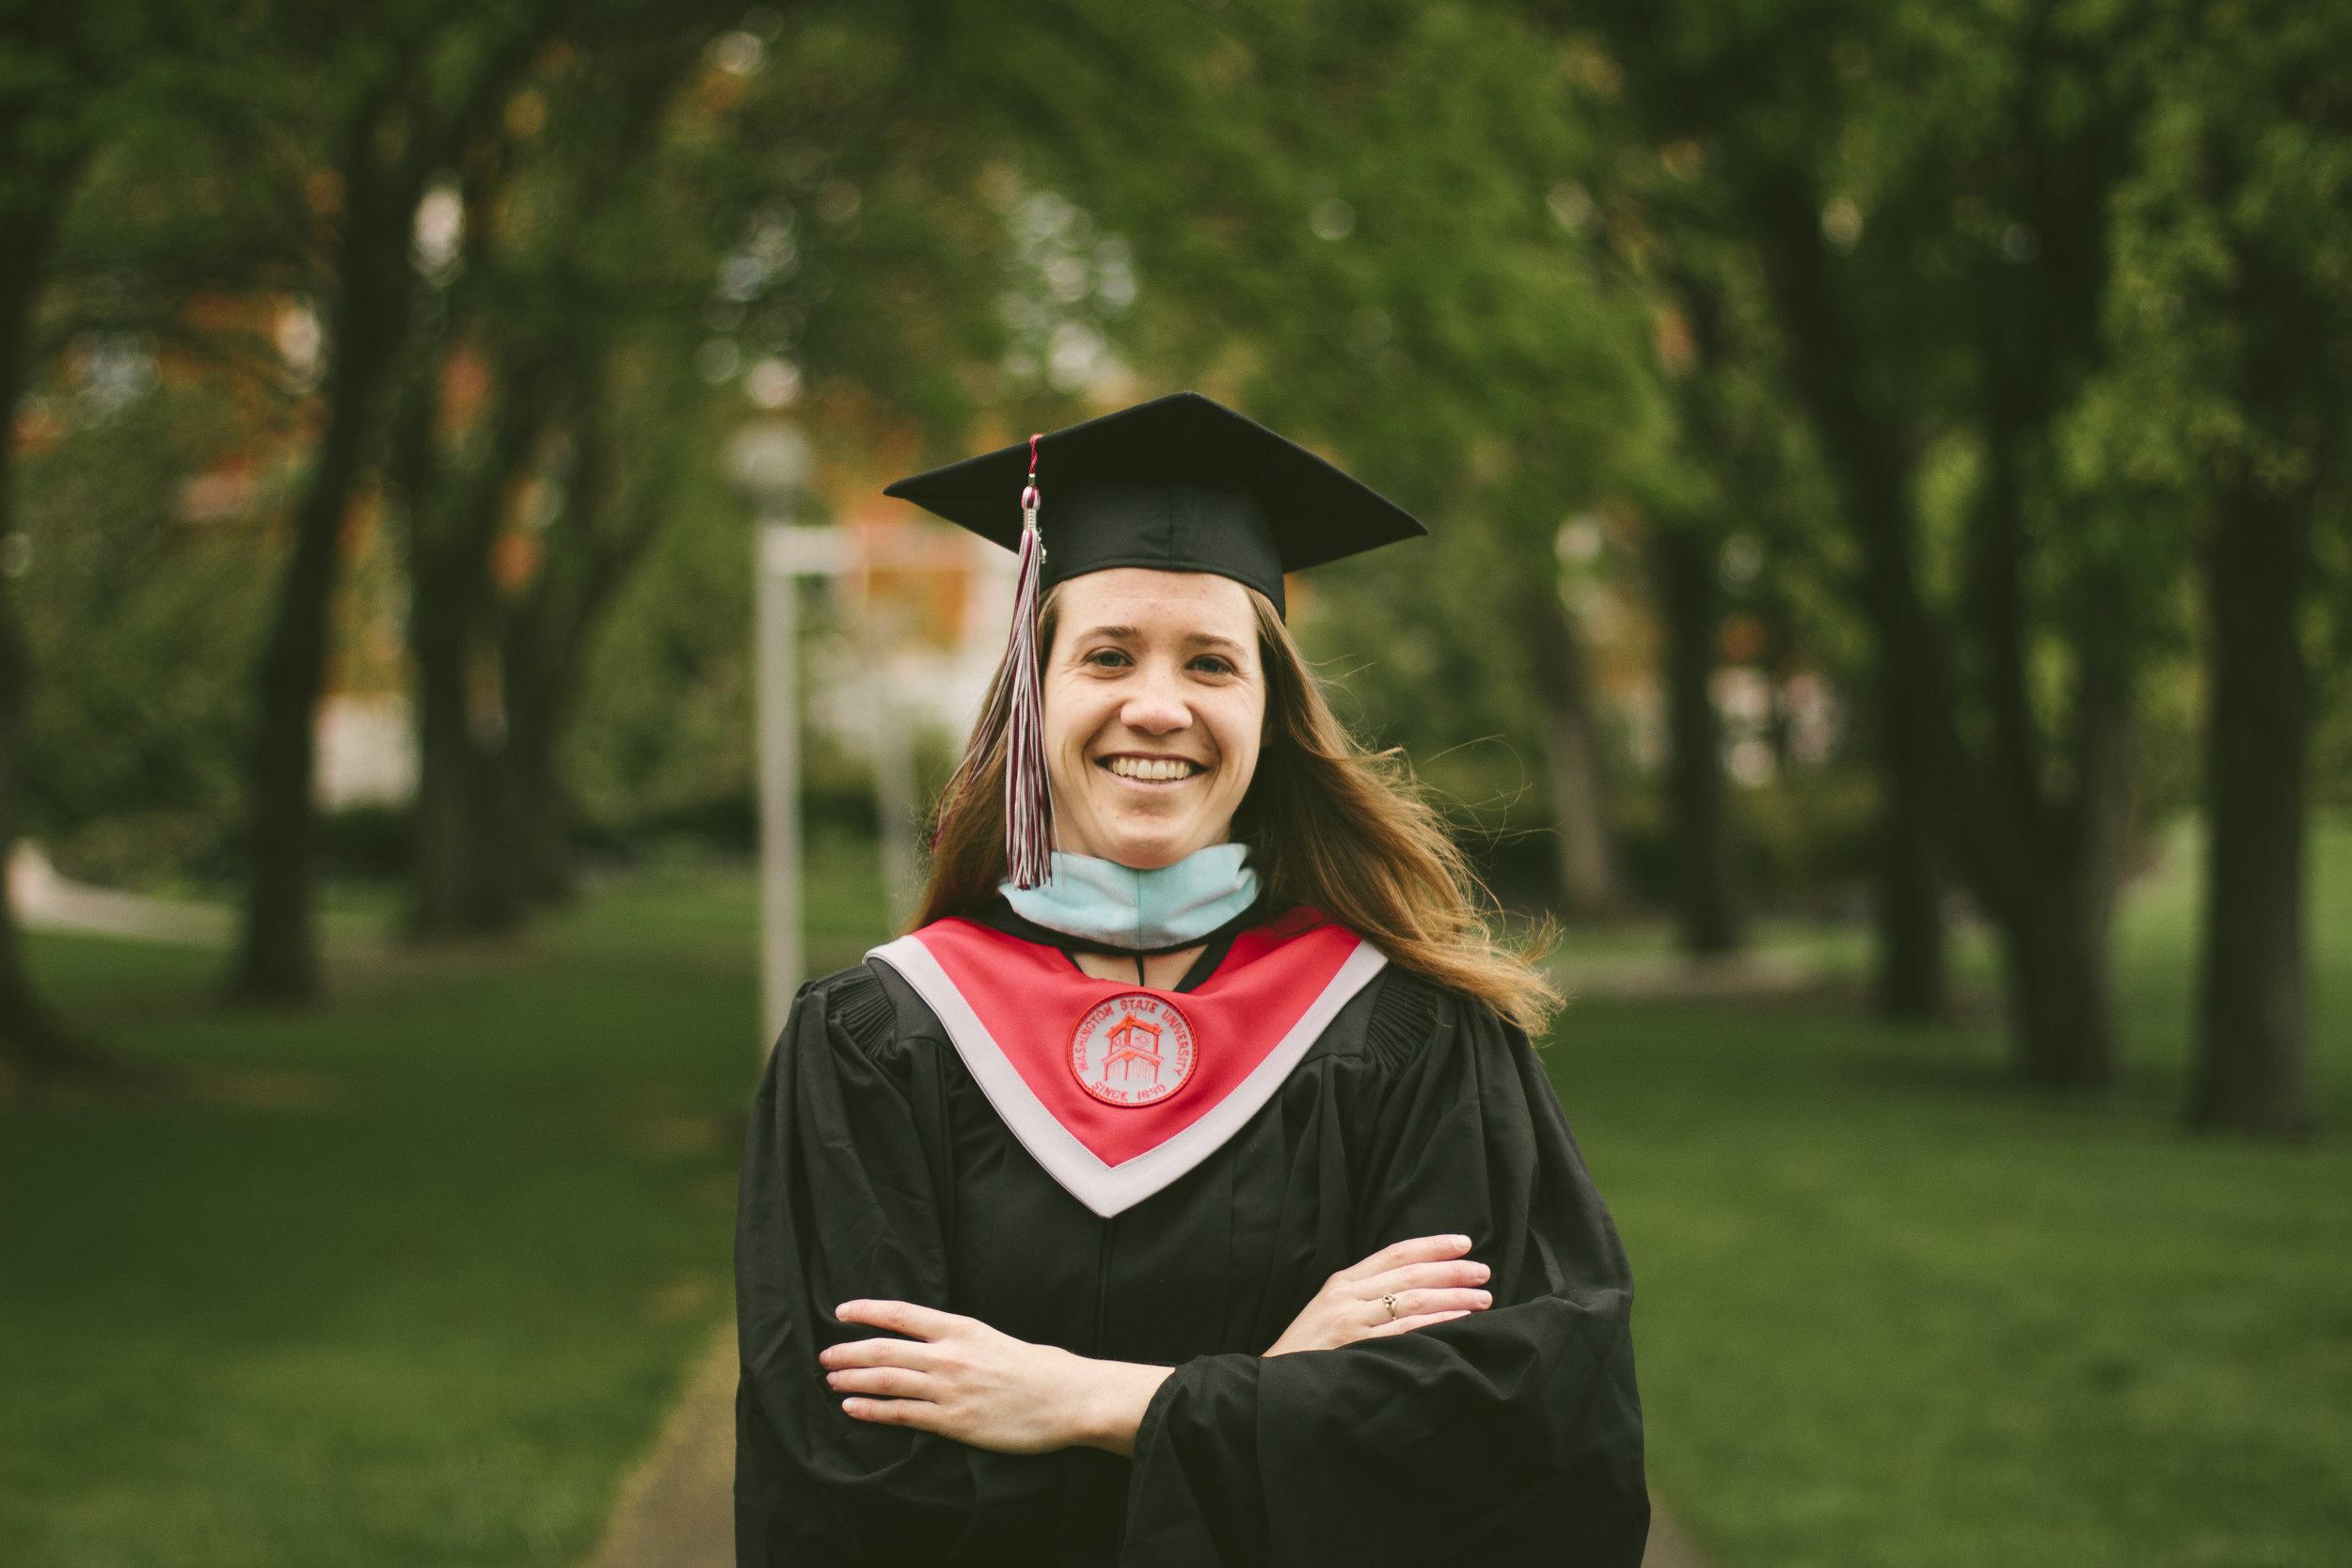 Kelly_Graduation-3.jpg